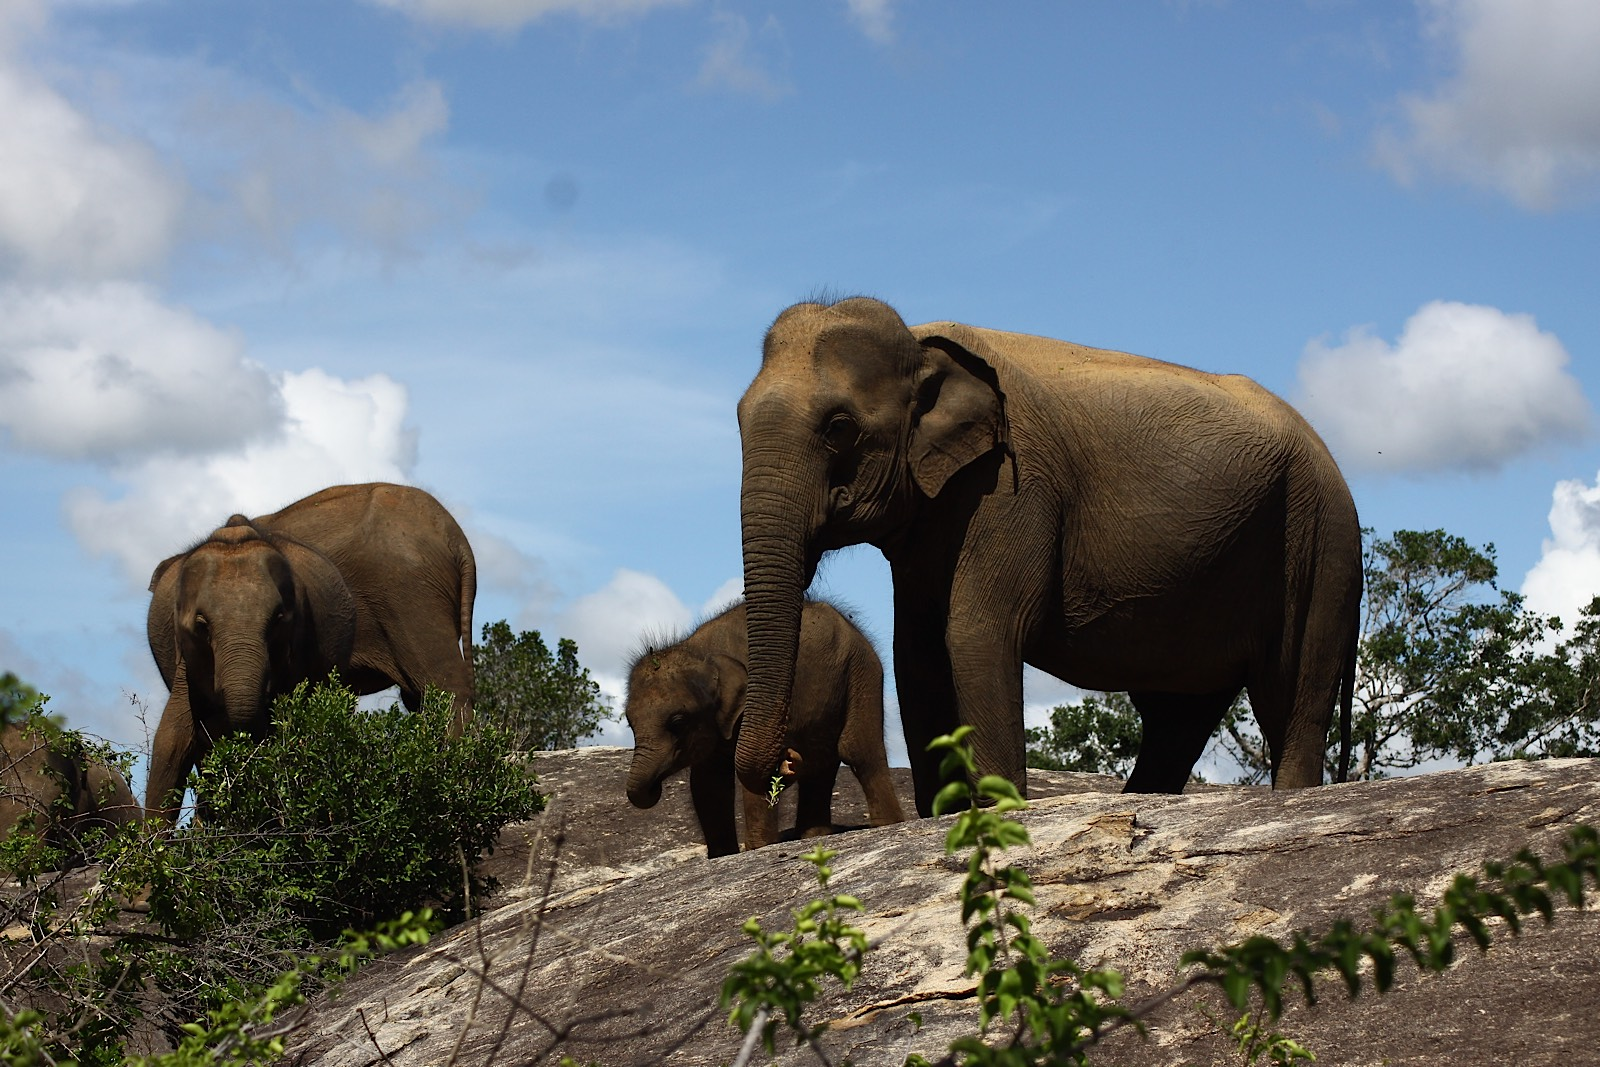 invite-to-paradise-holiday-honeymoon-sri-lanka-specialists-safari-lodge-cinnamon-wild-hotel-11.jpg